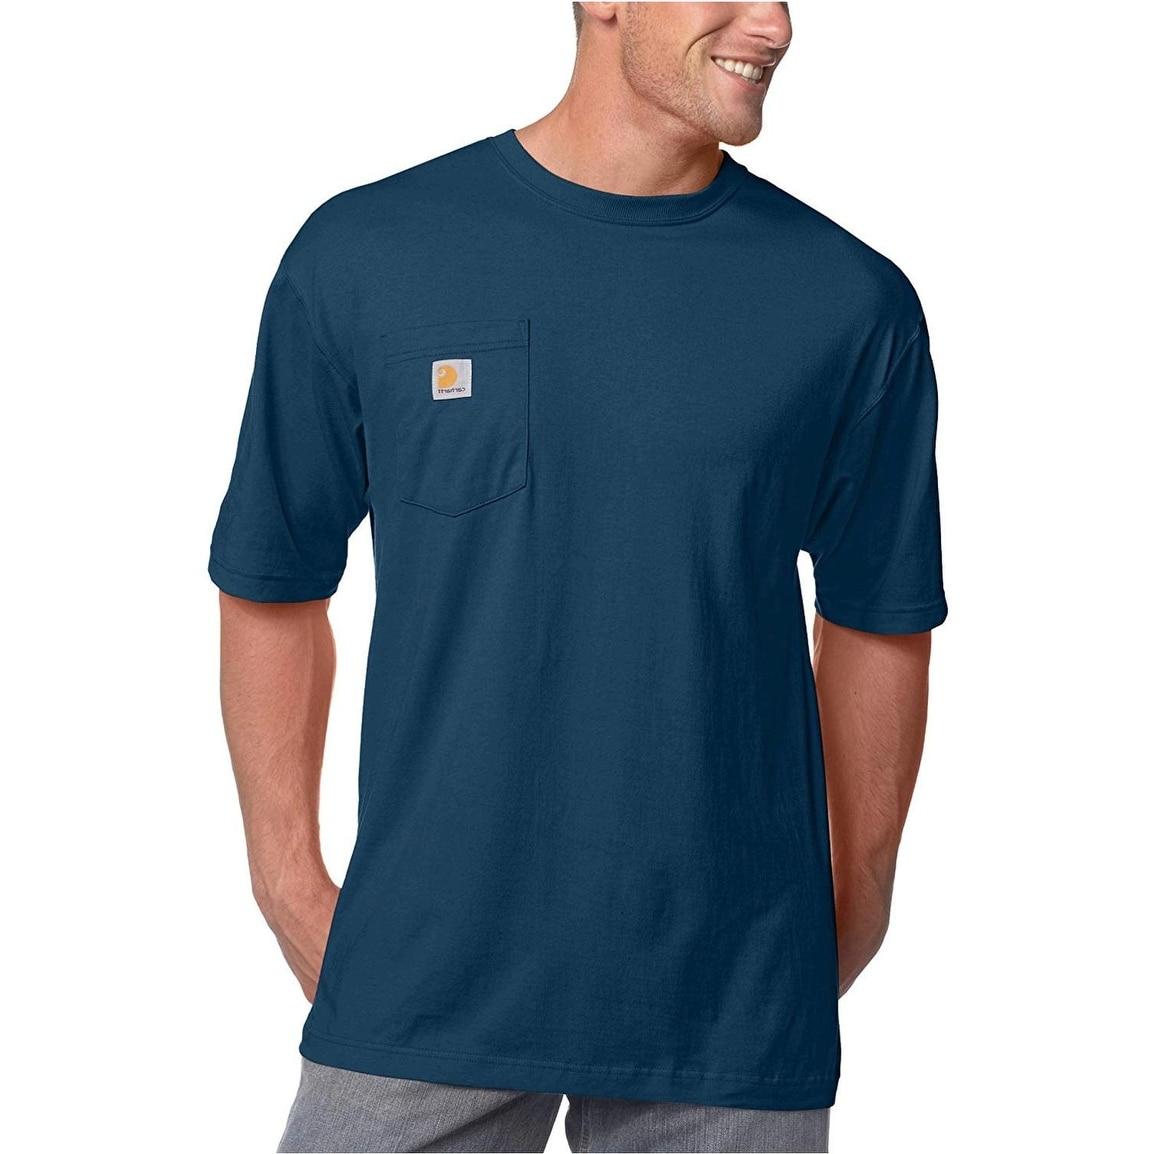 Carhartt Men's K87 Workwear Pocket Short Sleeve T-shirt, Navy, Size X-Large Tall - X-Large Tall